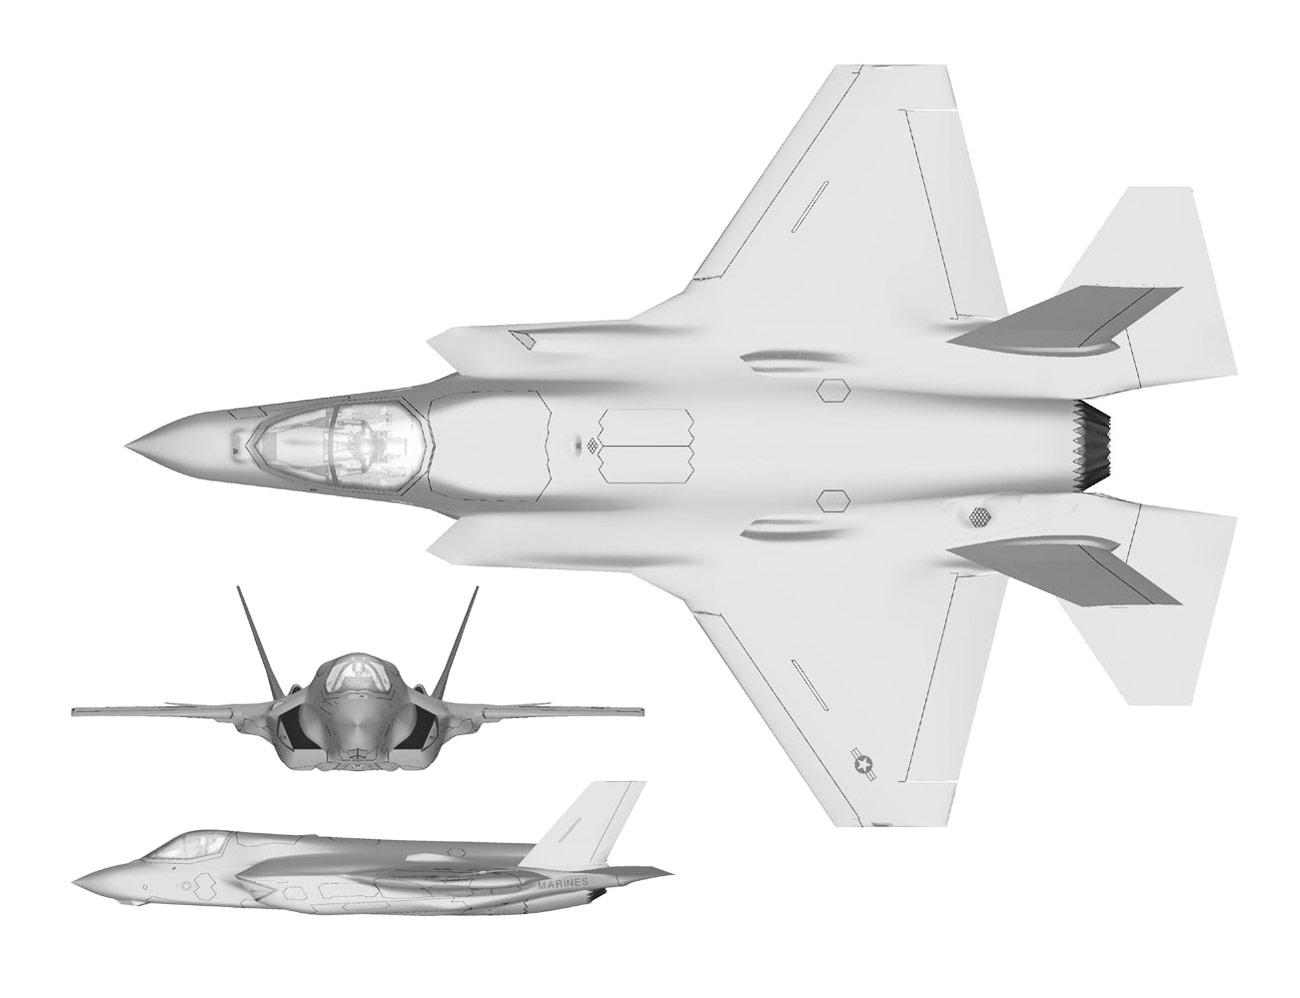 F-35 blueprint